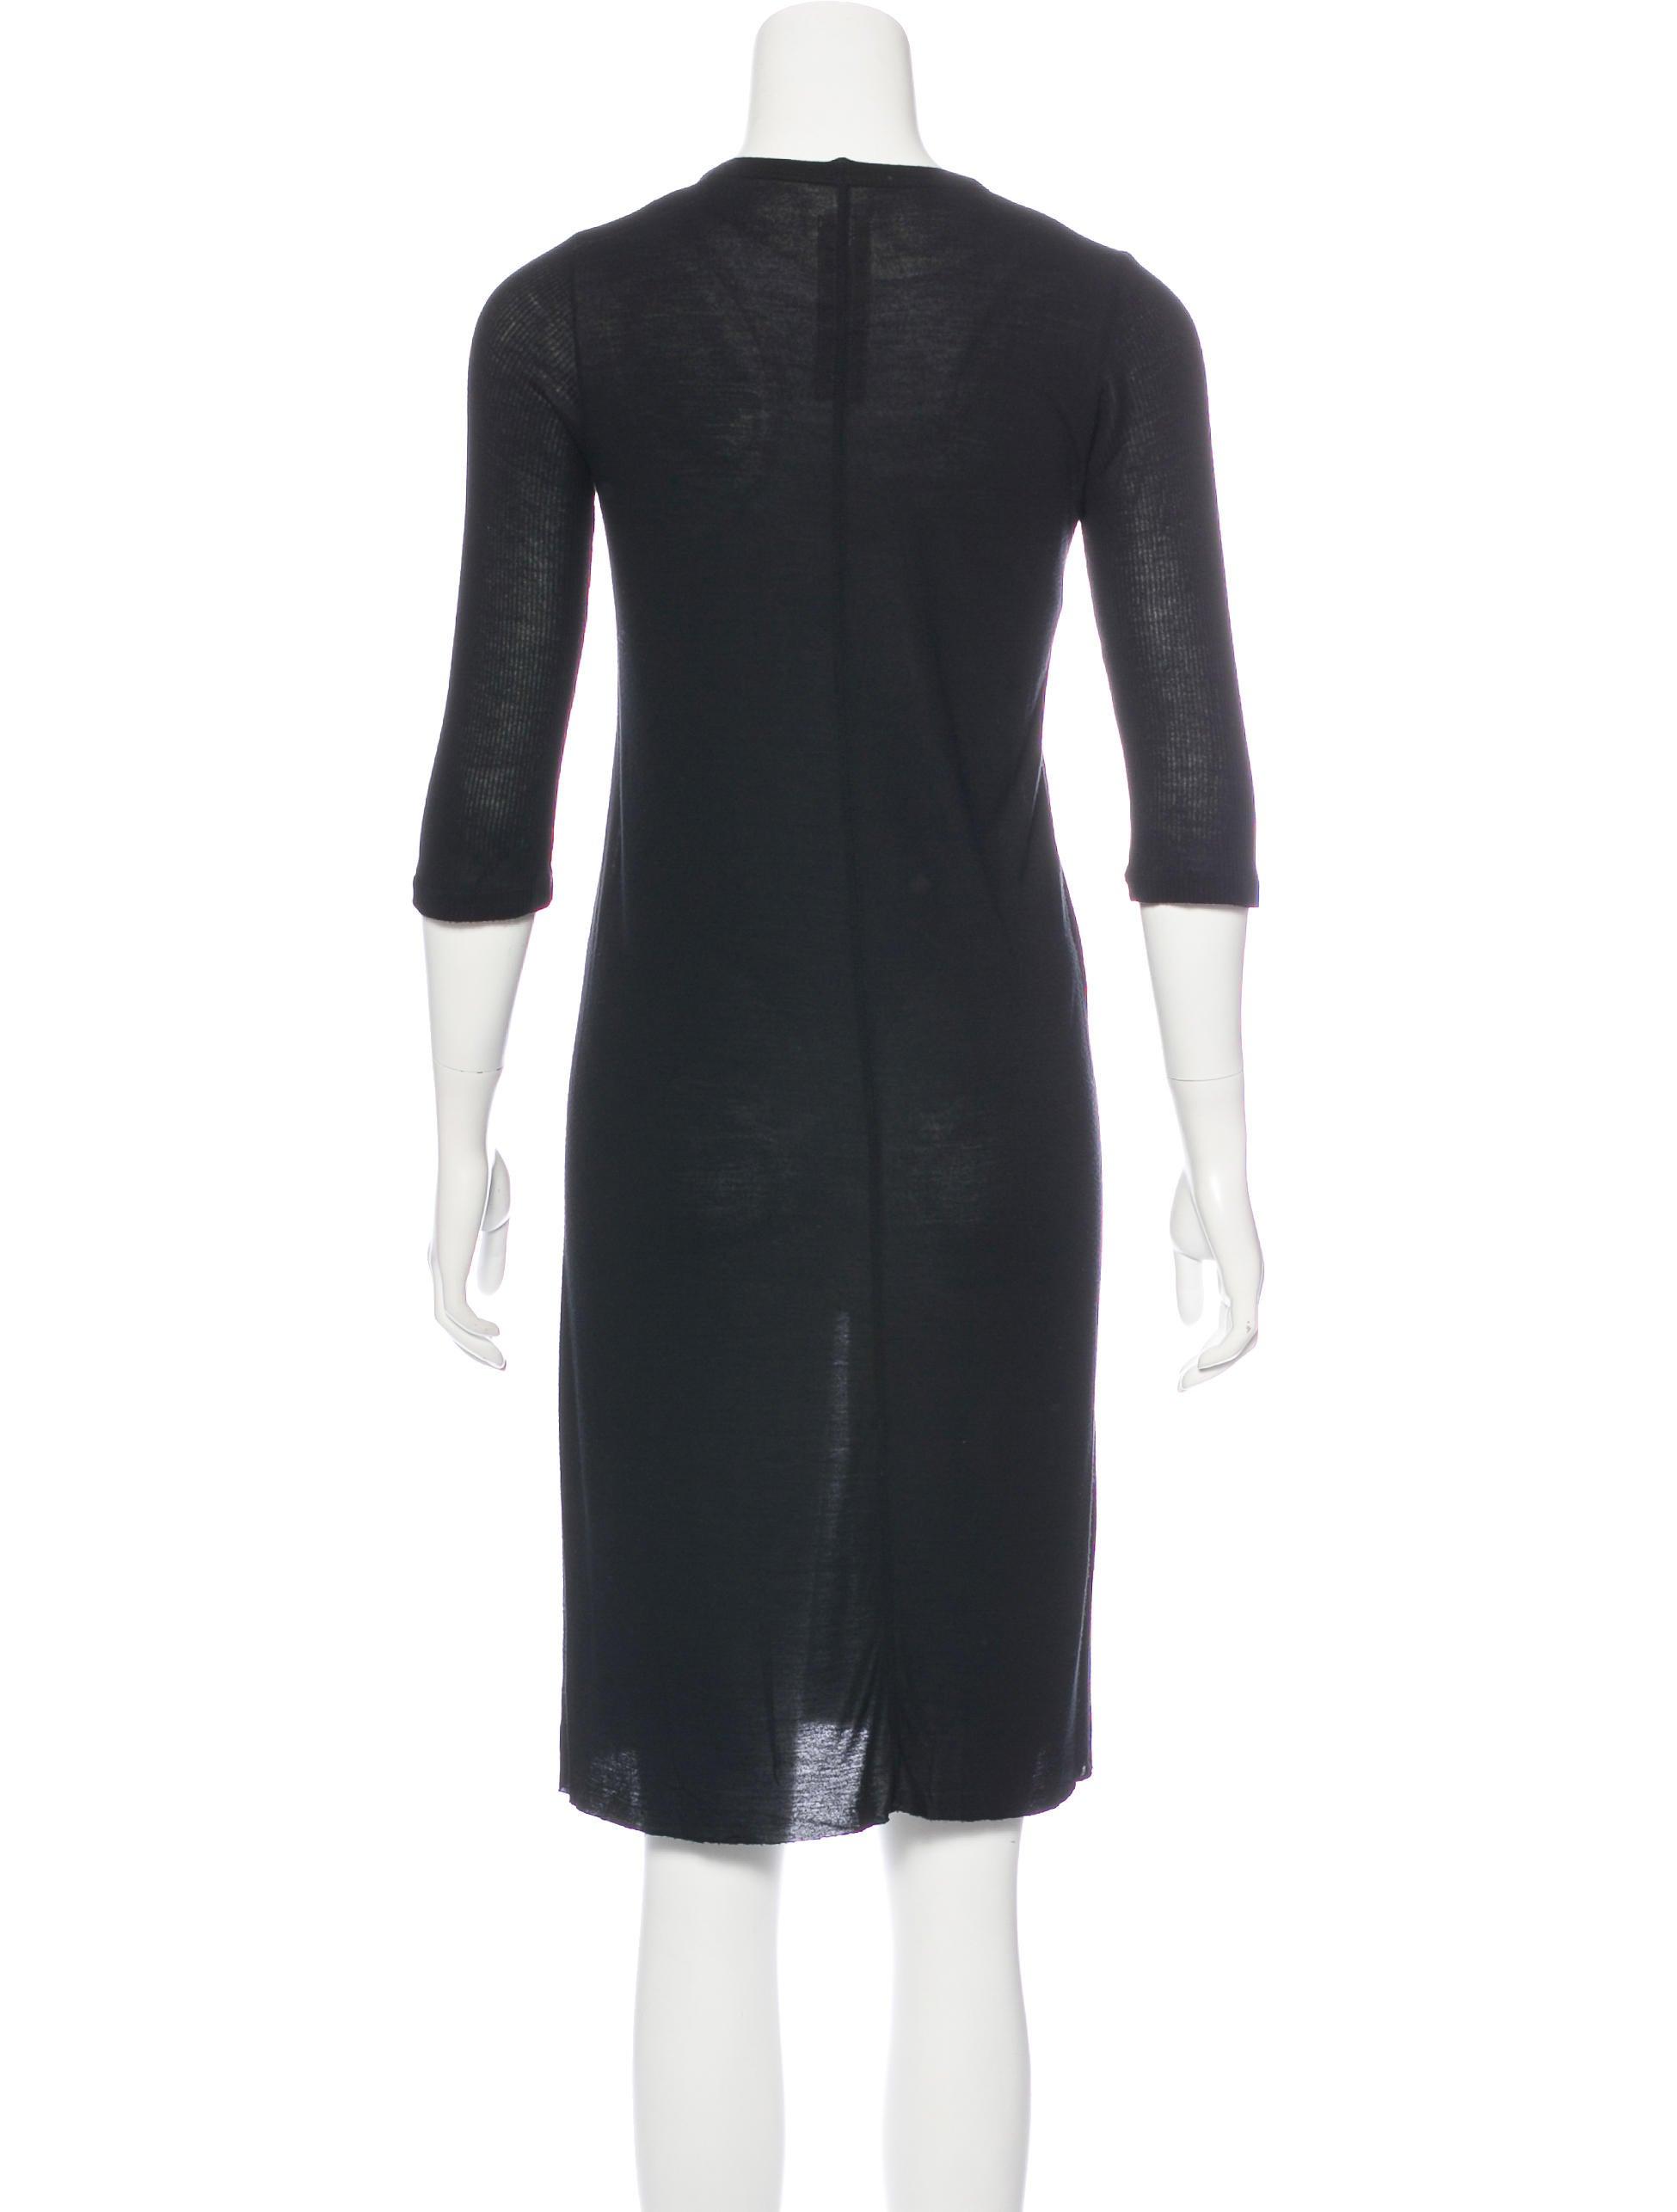 Rick Owens Knee Length T Shirt Dress Clothing Ric29815 The